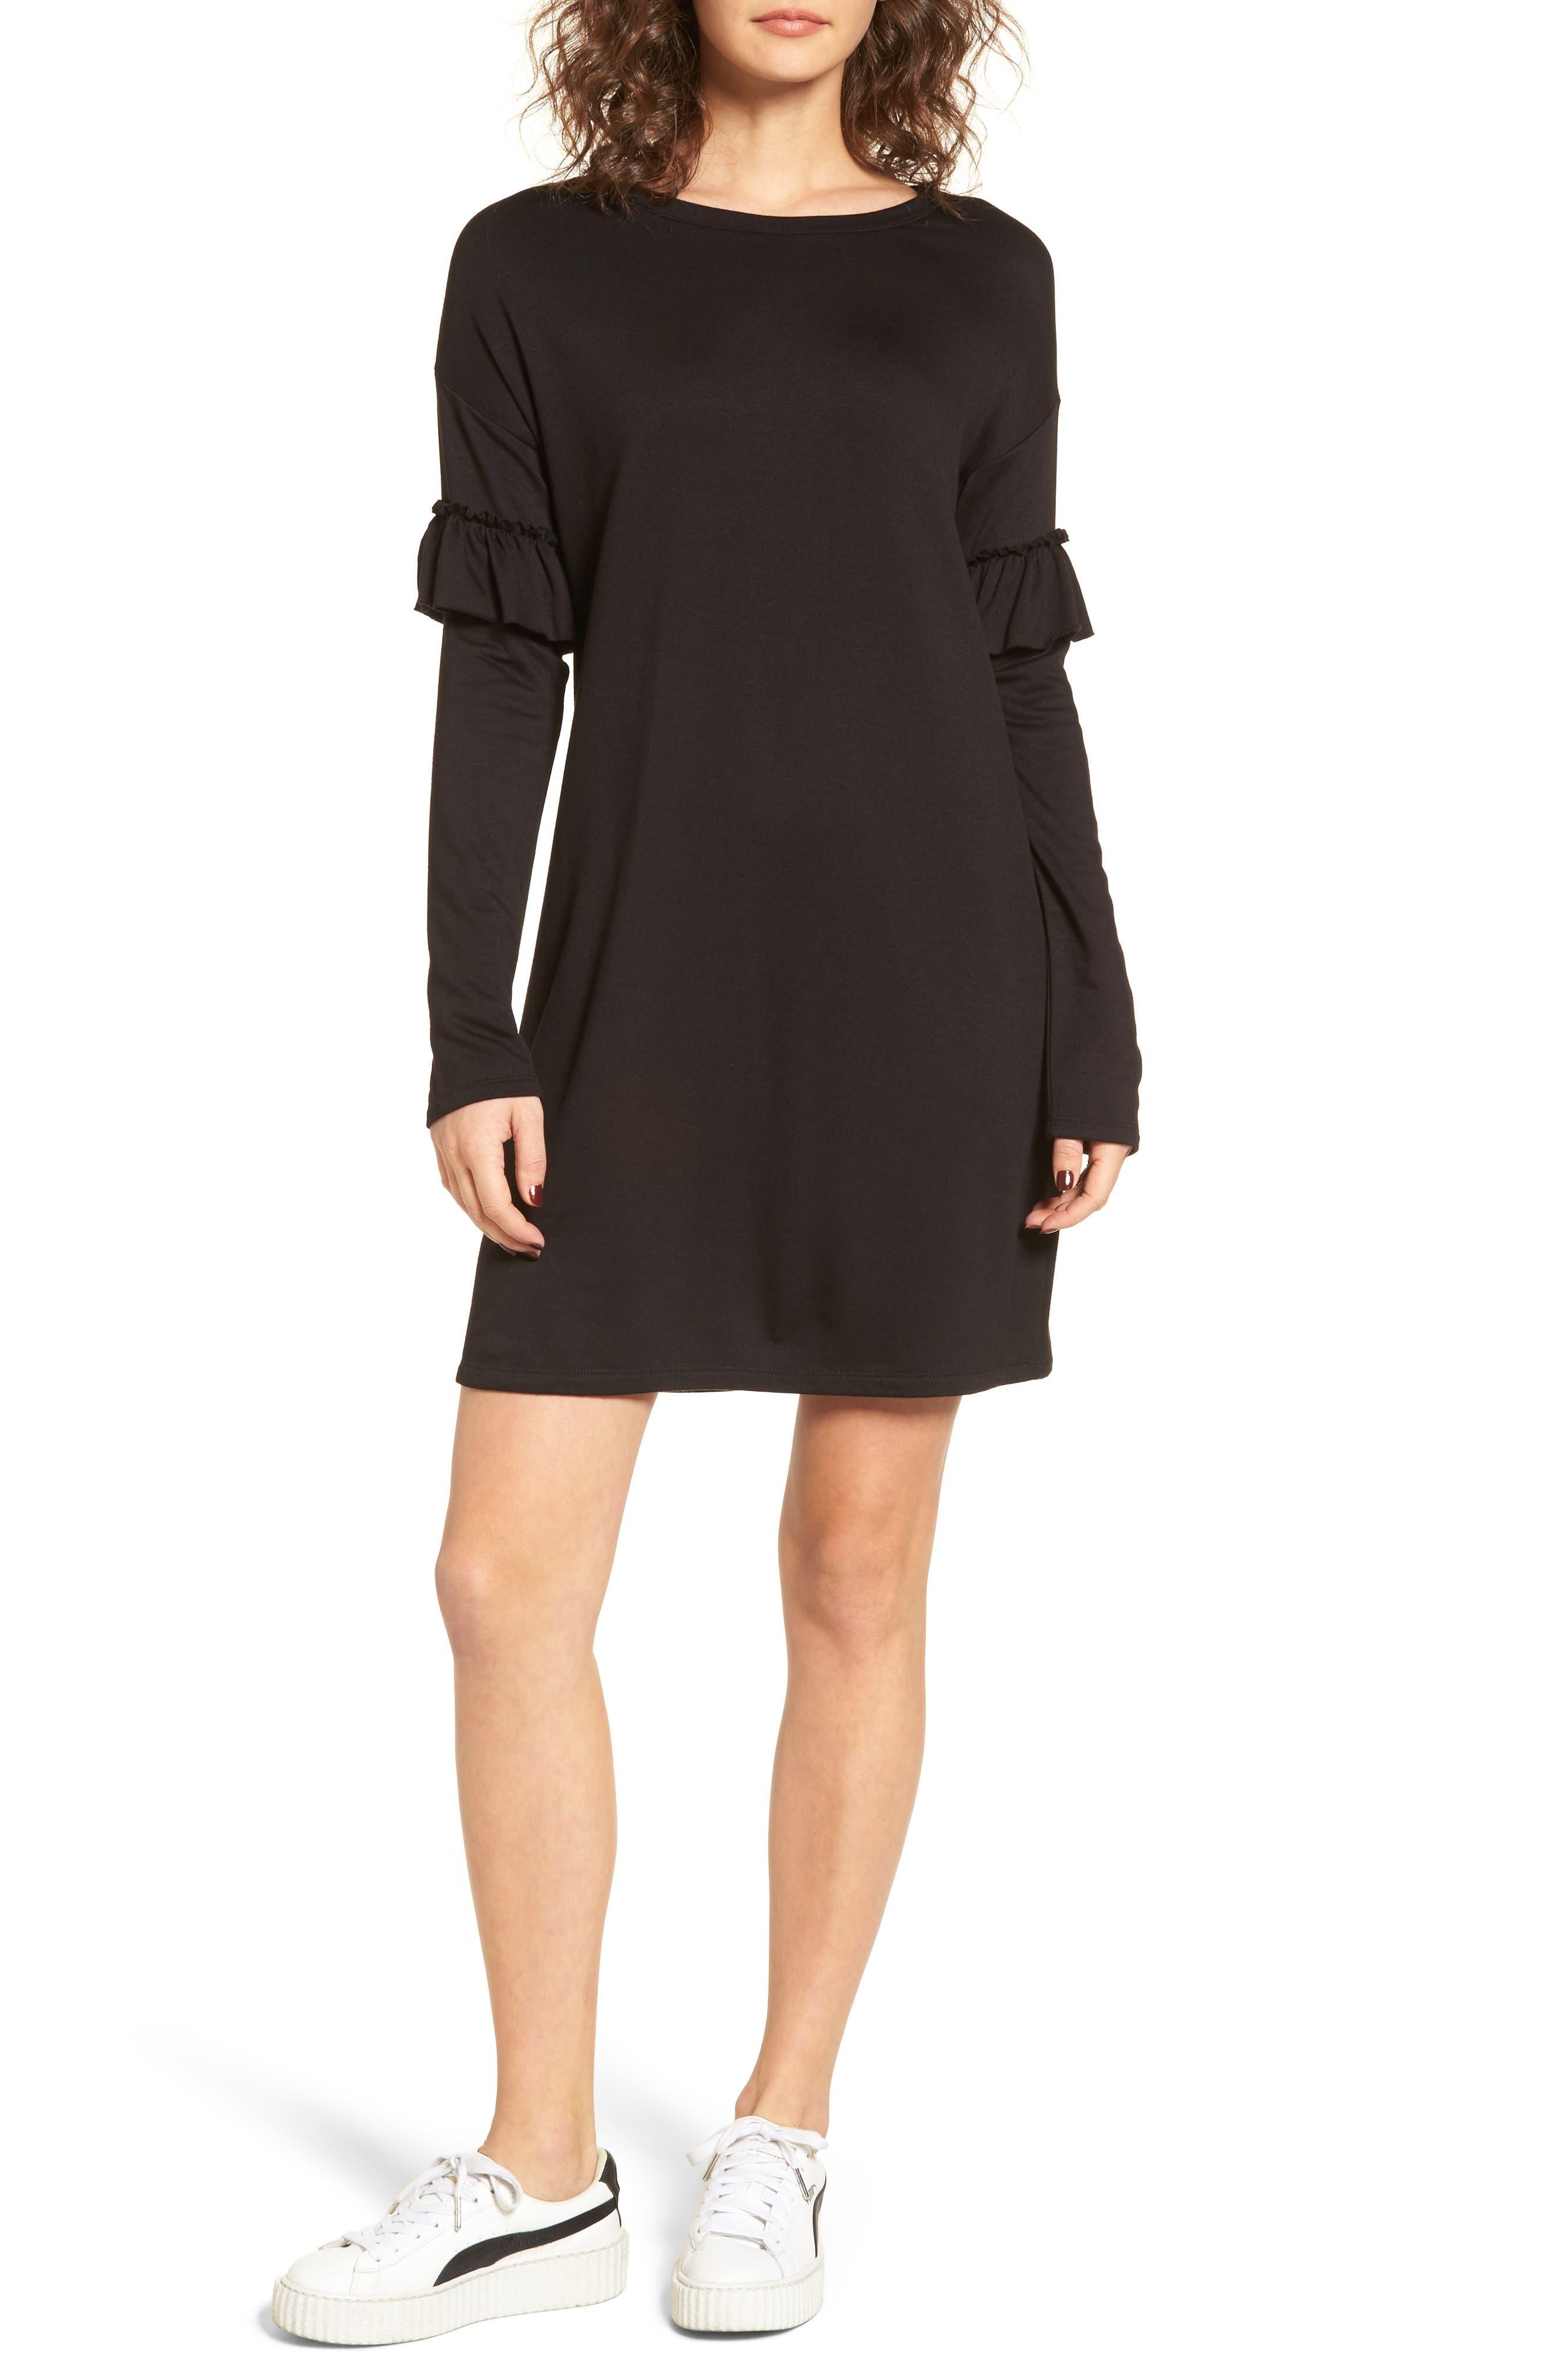 Ruffle Sleeve Sweater Dress,                             Main thumbnail 1, color,                             001